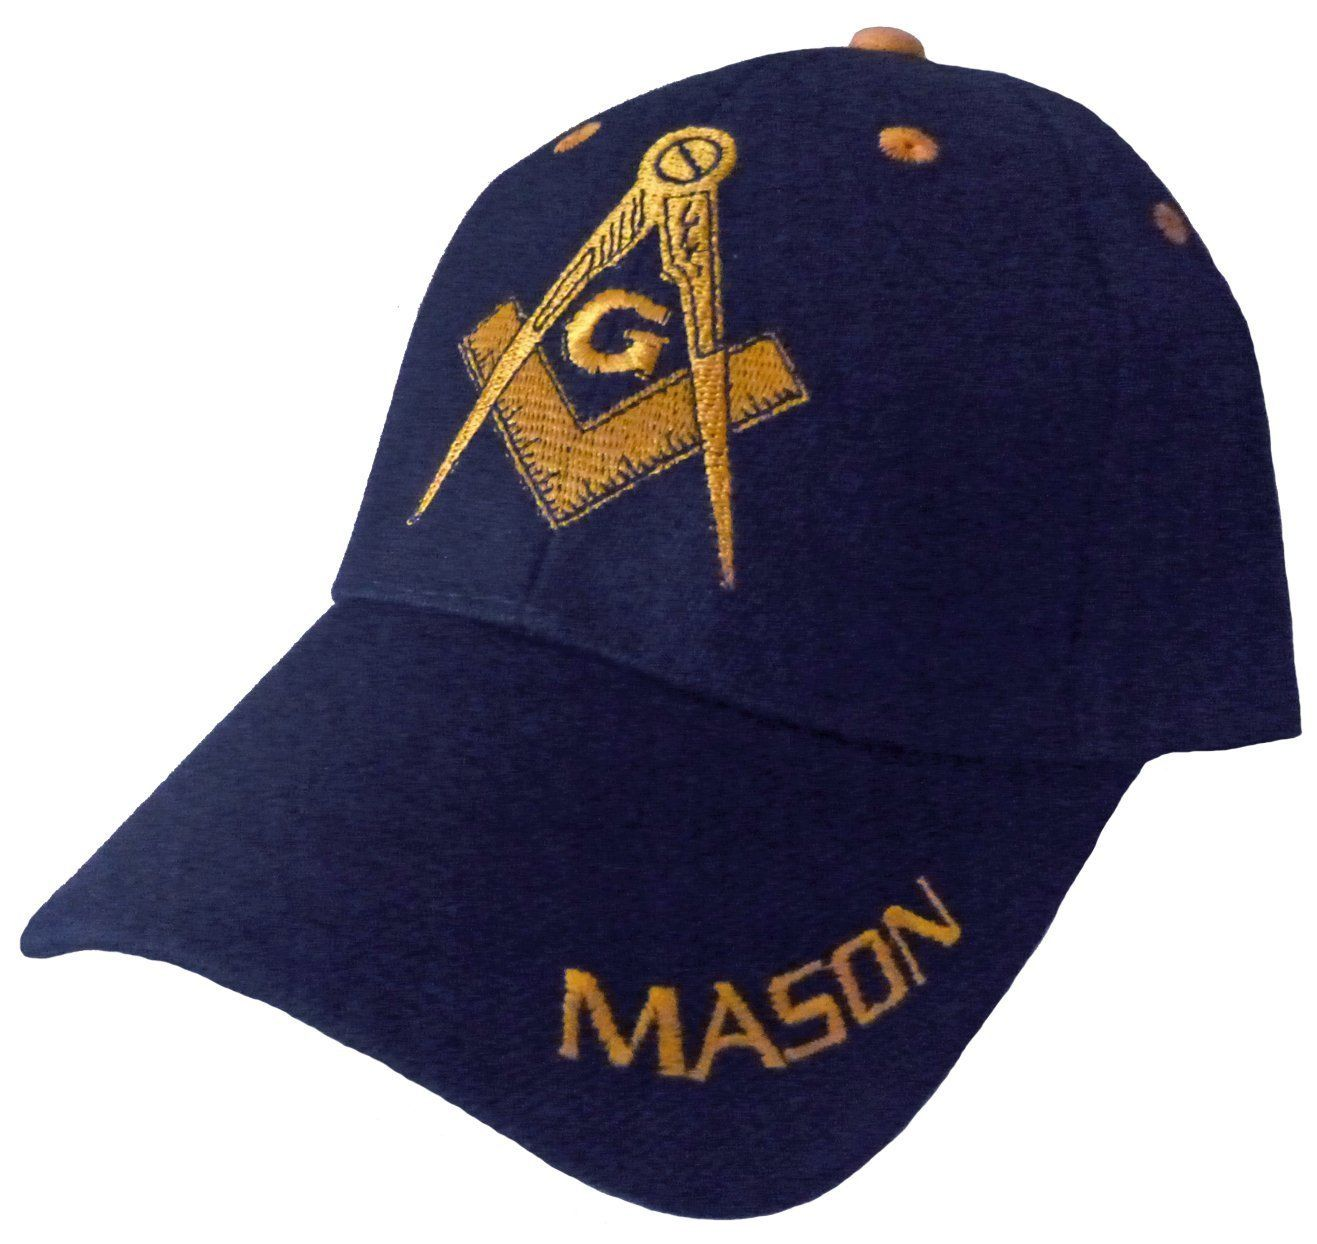 Mason Hat Navy Blue Baseball Cap with Masonic Logo Freemasons Shriners  Prince Hall Lodge Headwear f8322adf375c